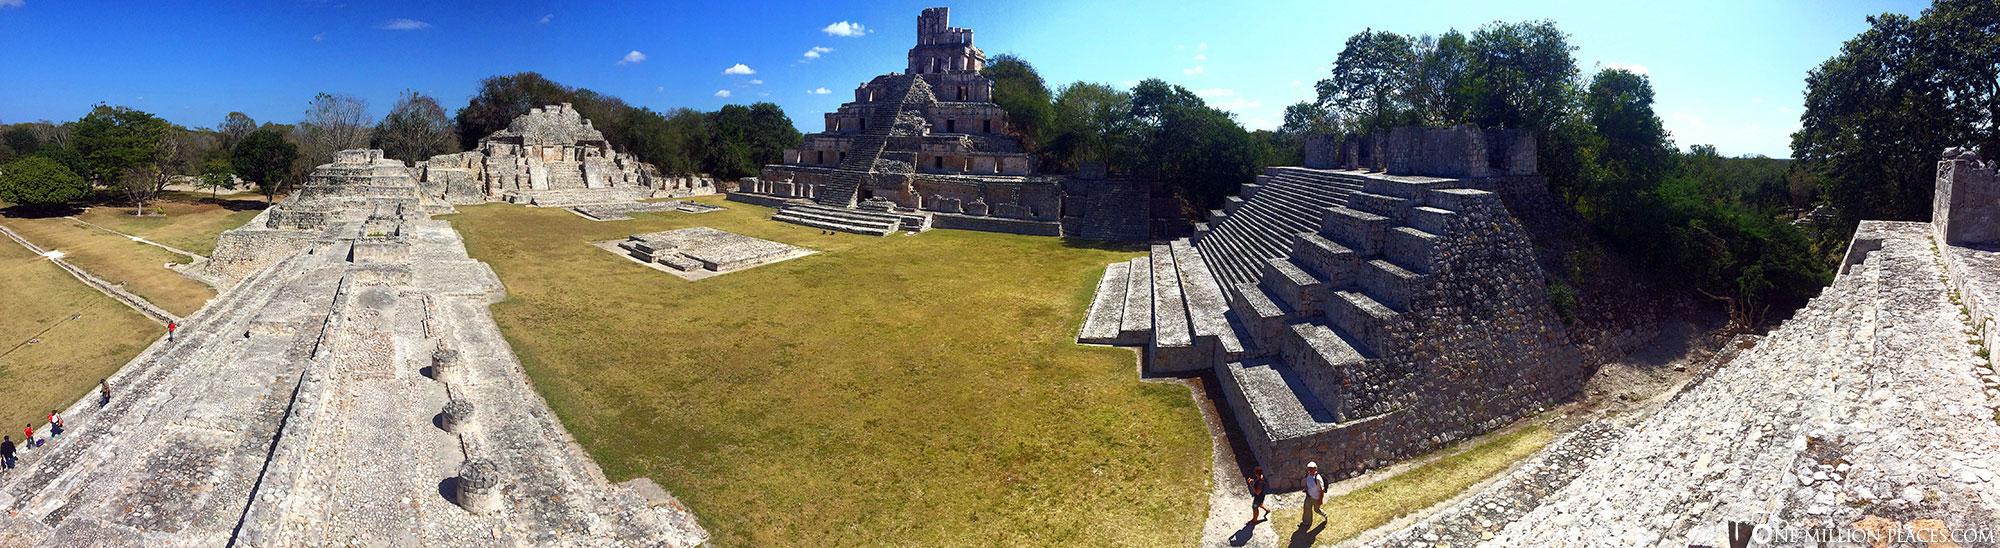 Panoramic view, Gran Acropolis Edzna, Mexico, Yucatan, travelogue